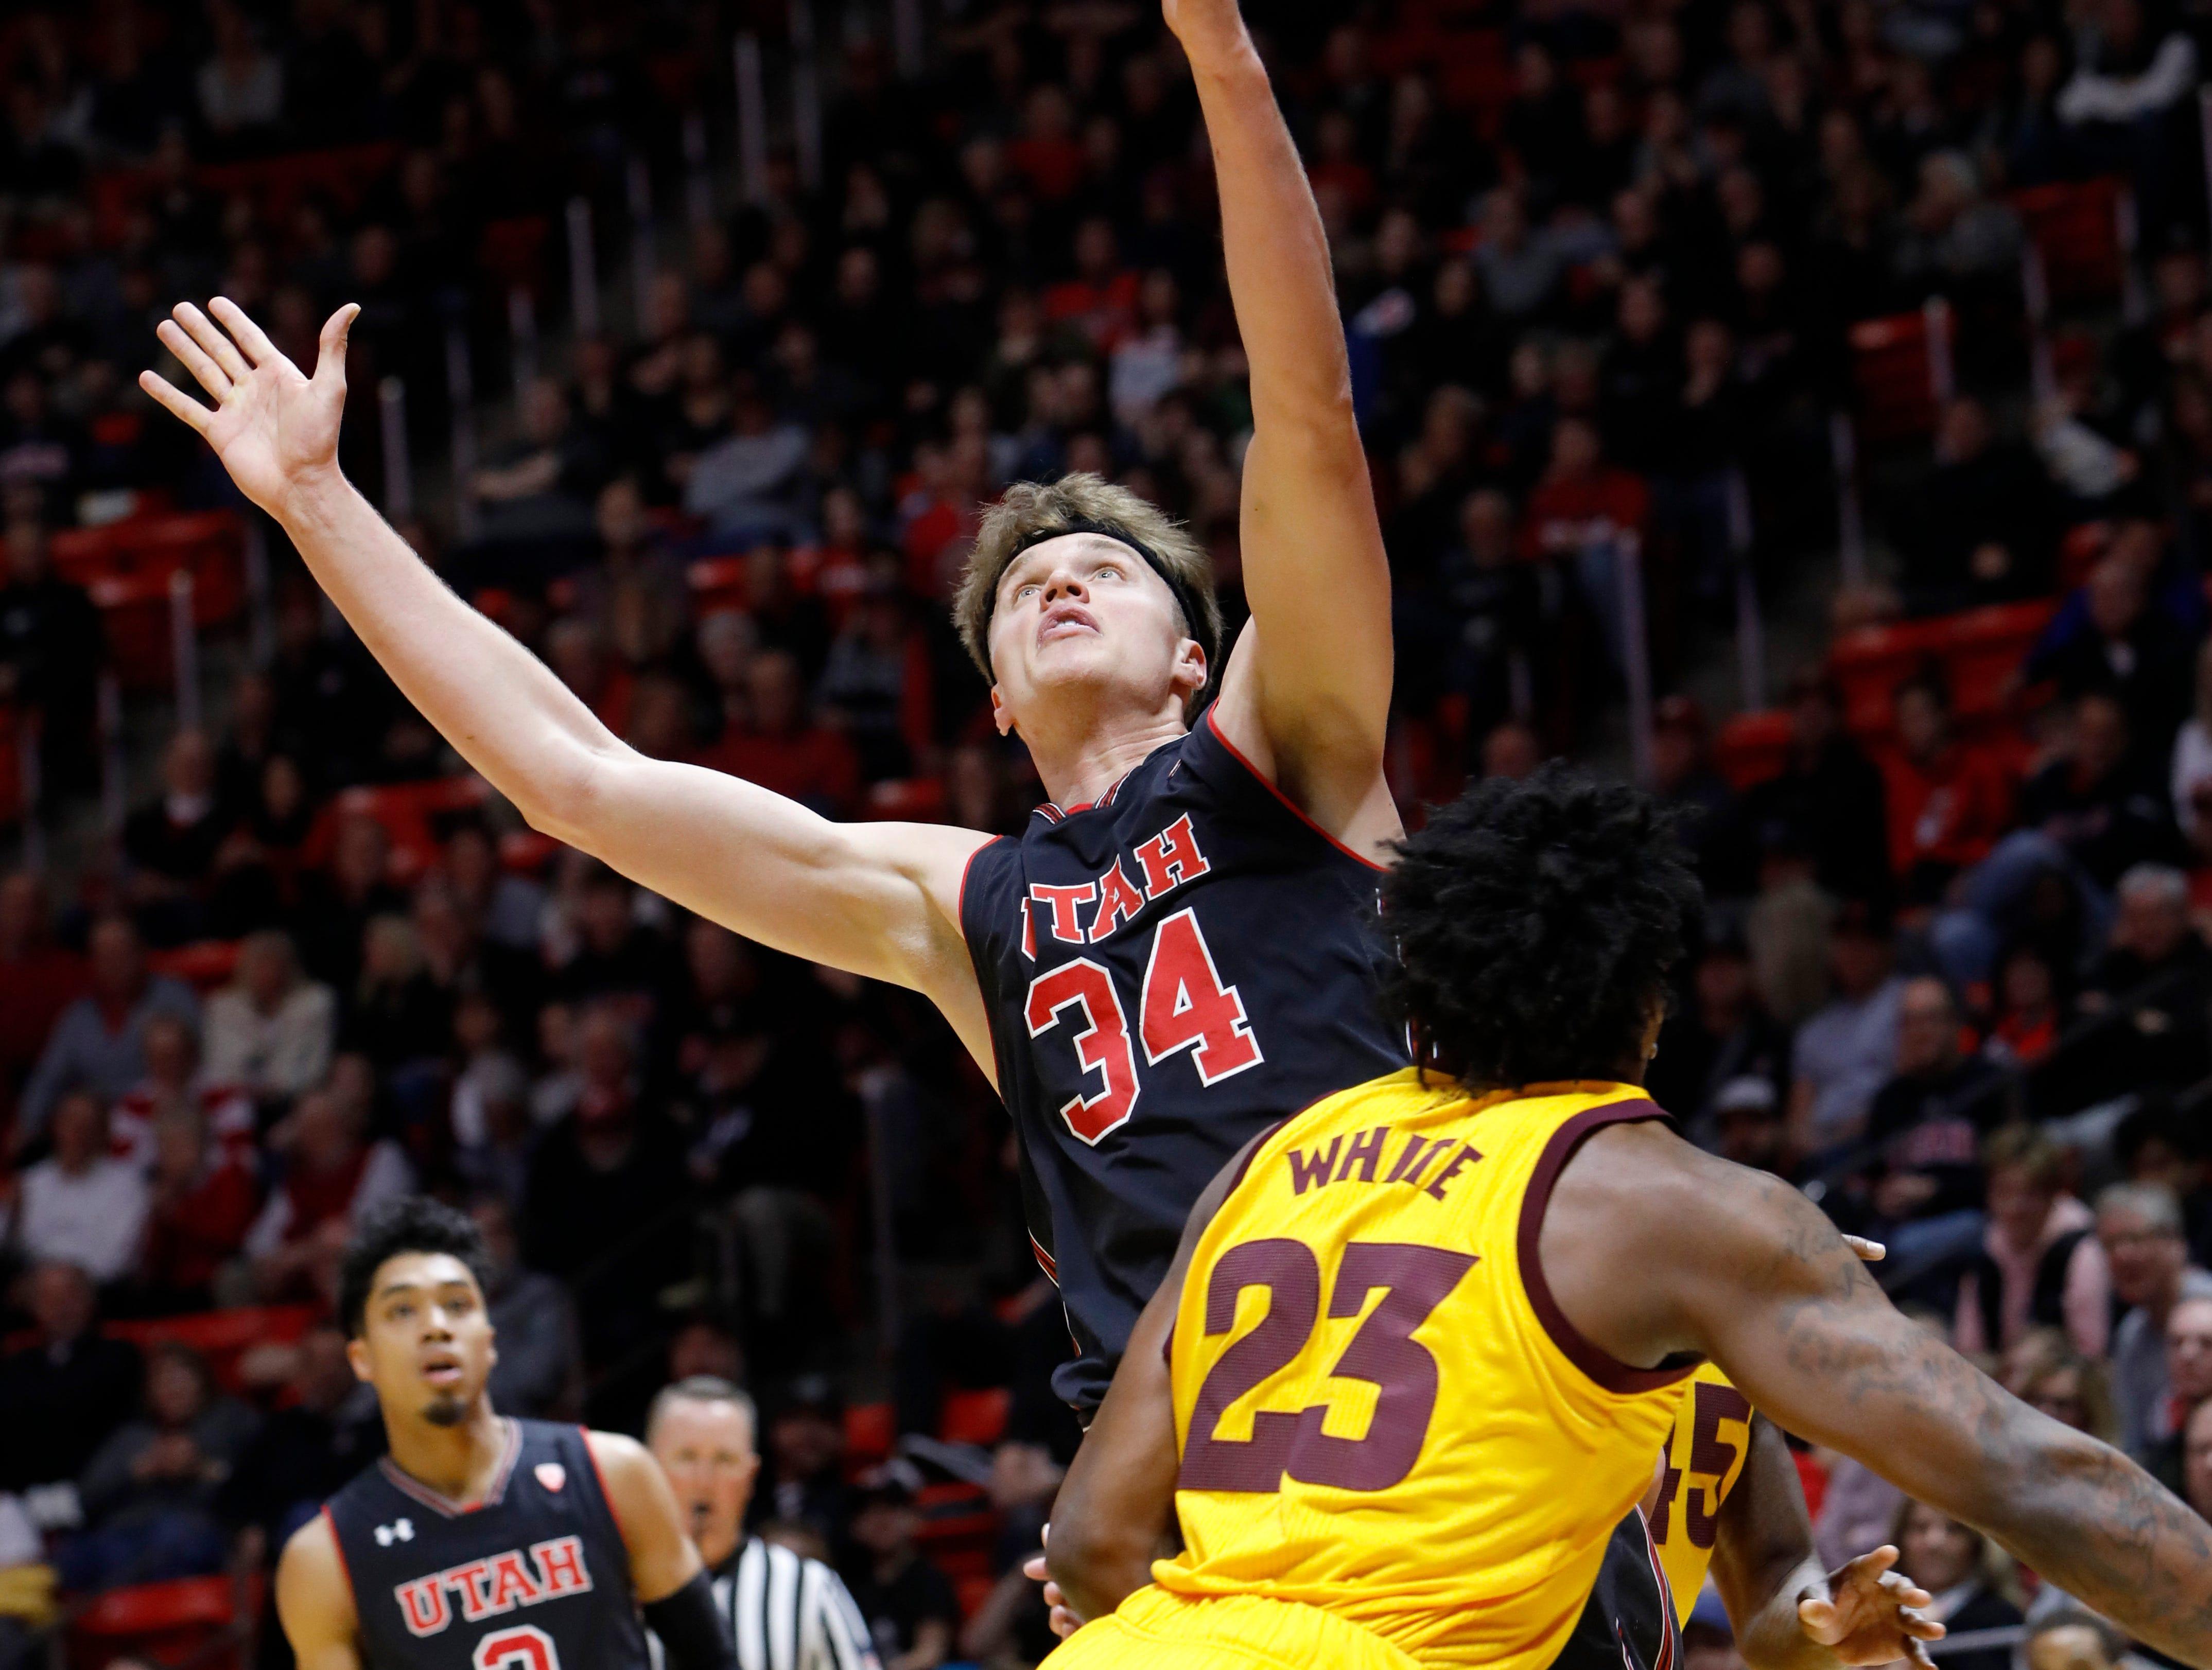 Utah's Jayce Johnson (34) reaches for a rebound next to Arizona State's Romello White (23) during the first half of an NCAA college basketball game Saturday, Feb. 16, 2019, in Salt Lake City. (AP Photo/Kim Raff)